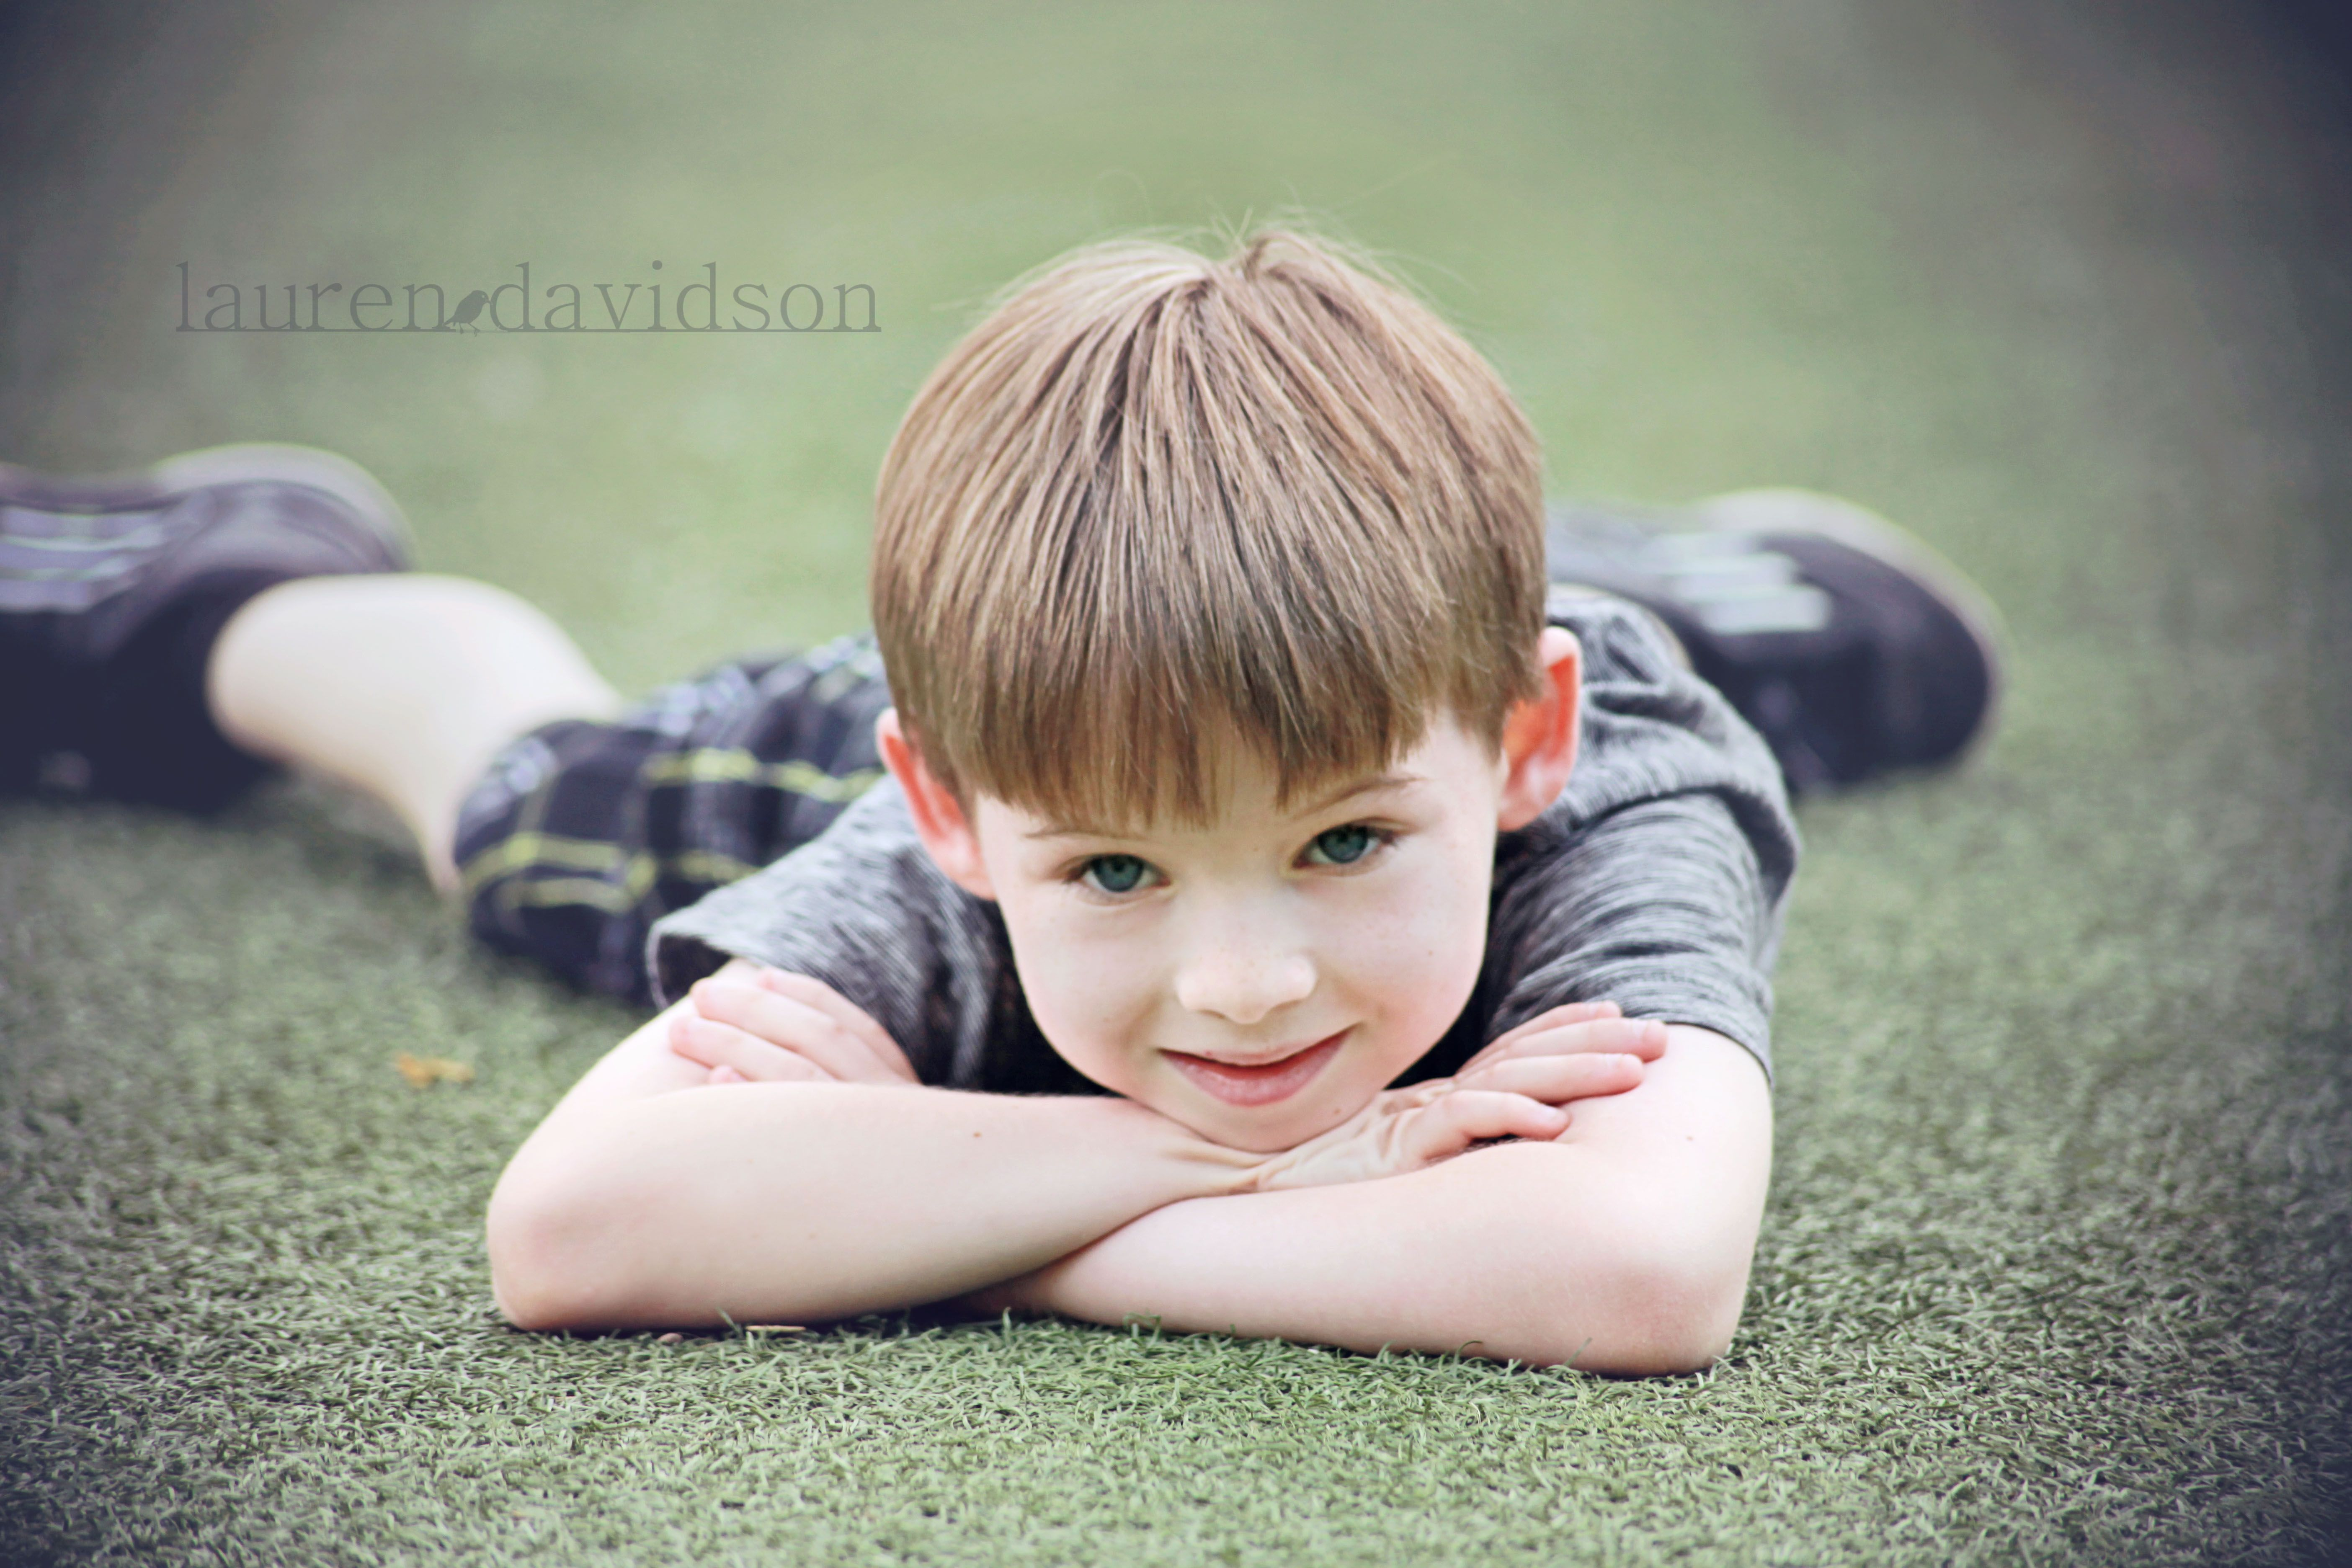 6 Year Old Boy Fun Playground Photo Ideas